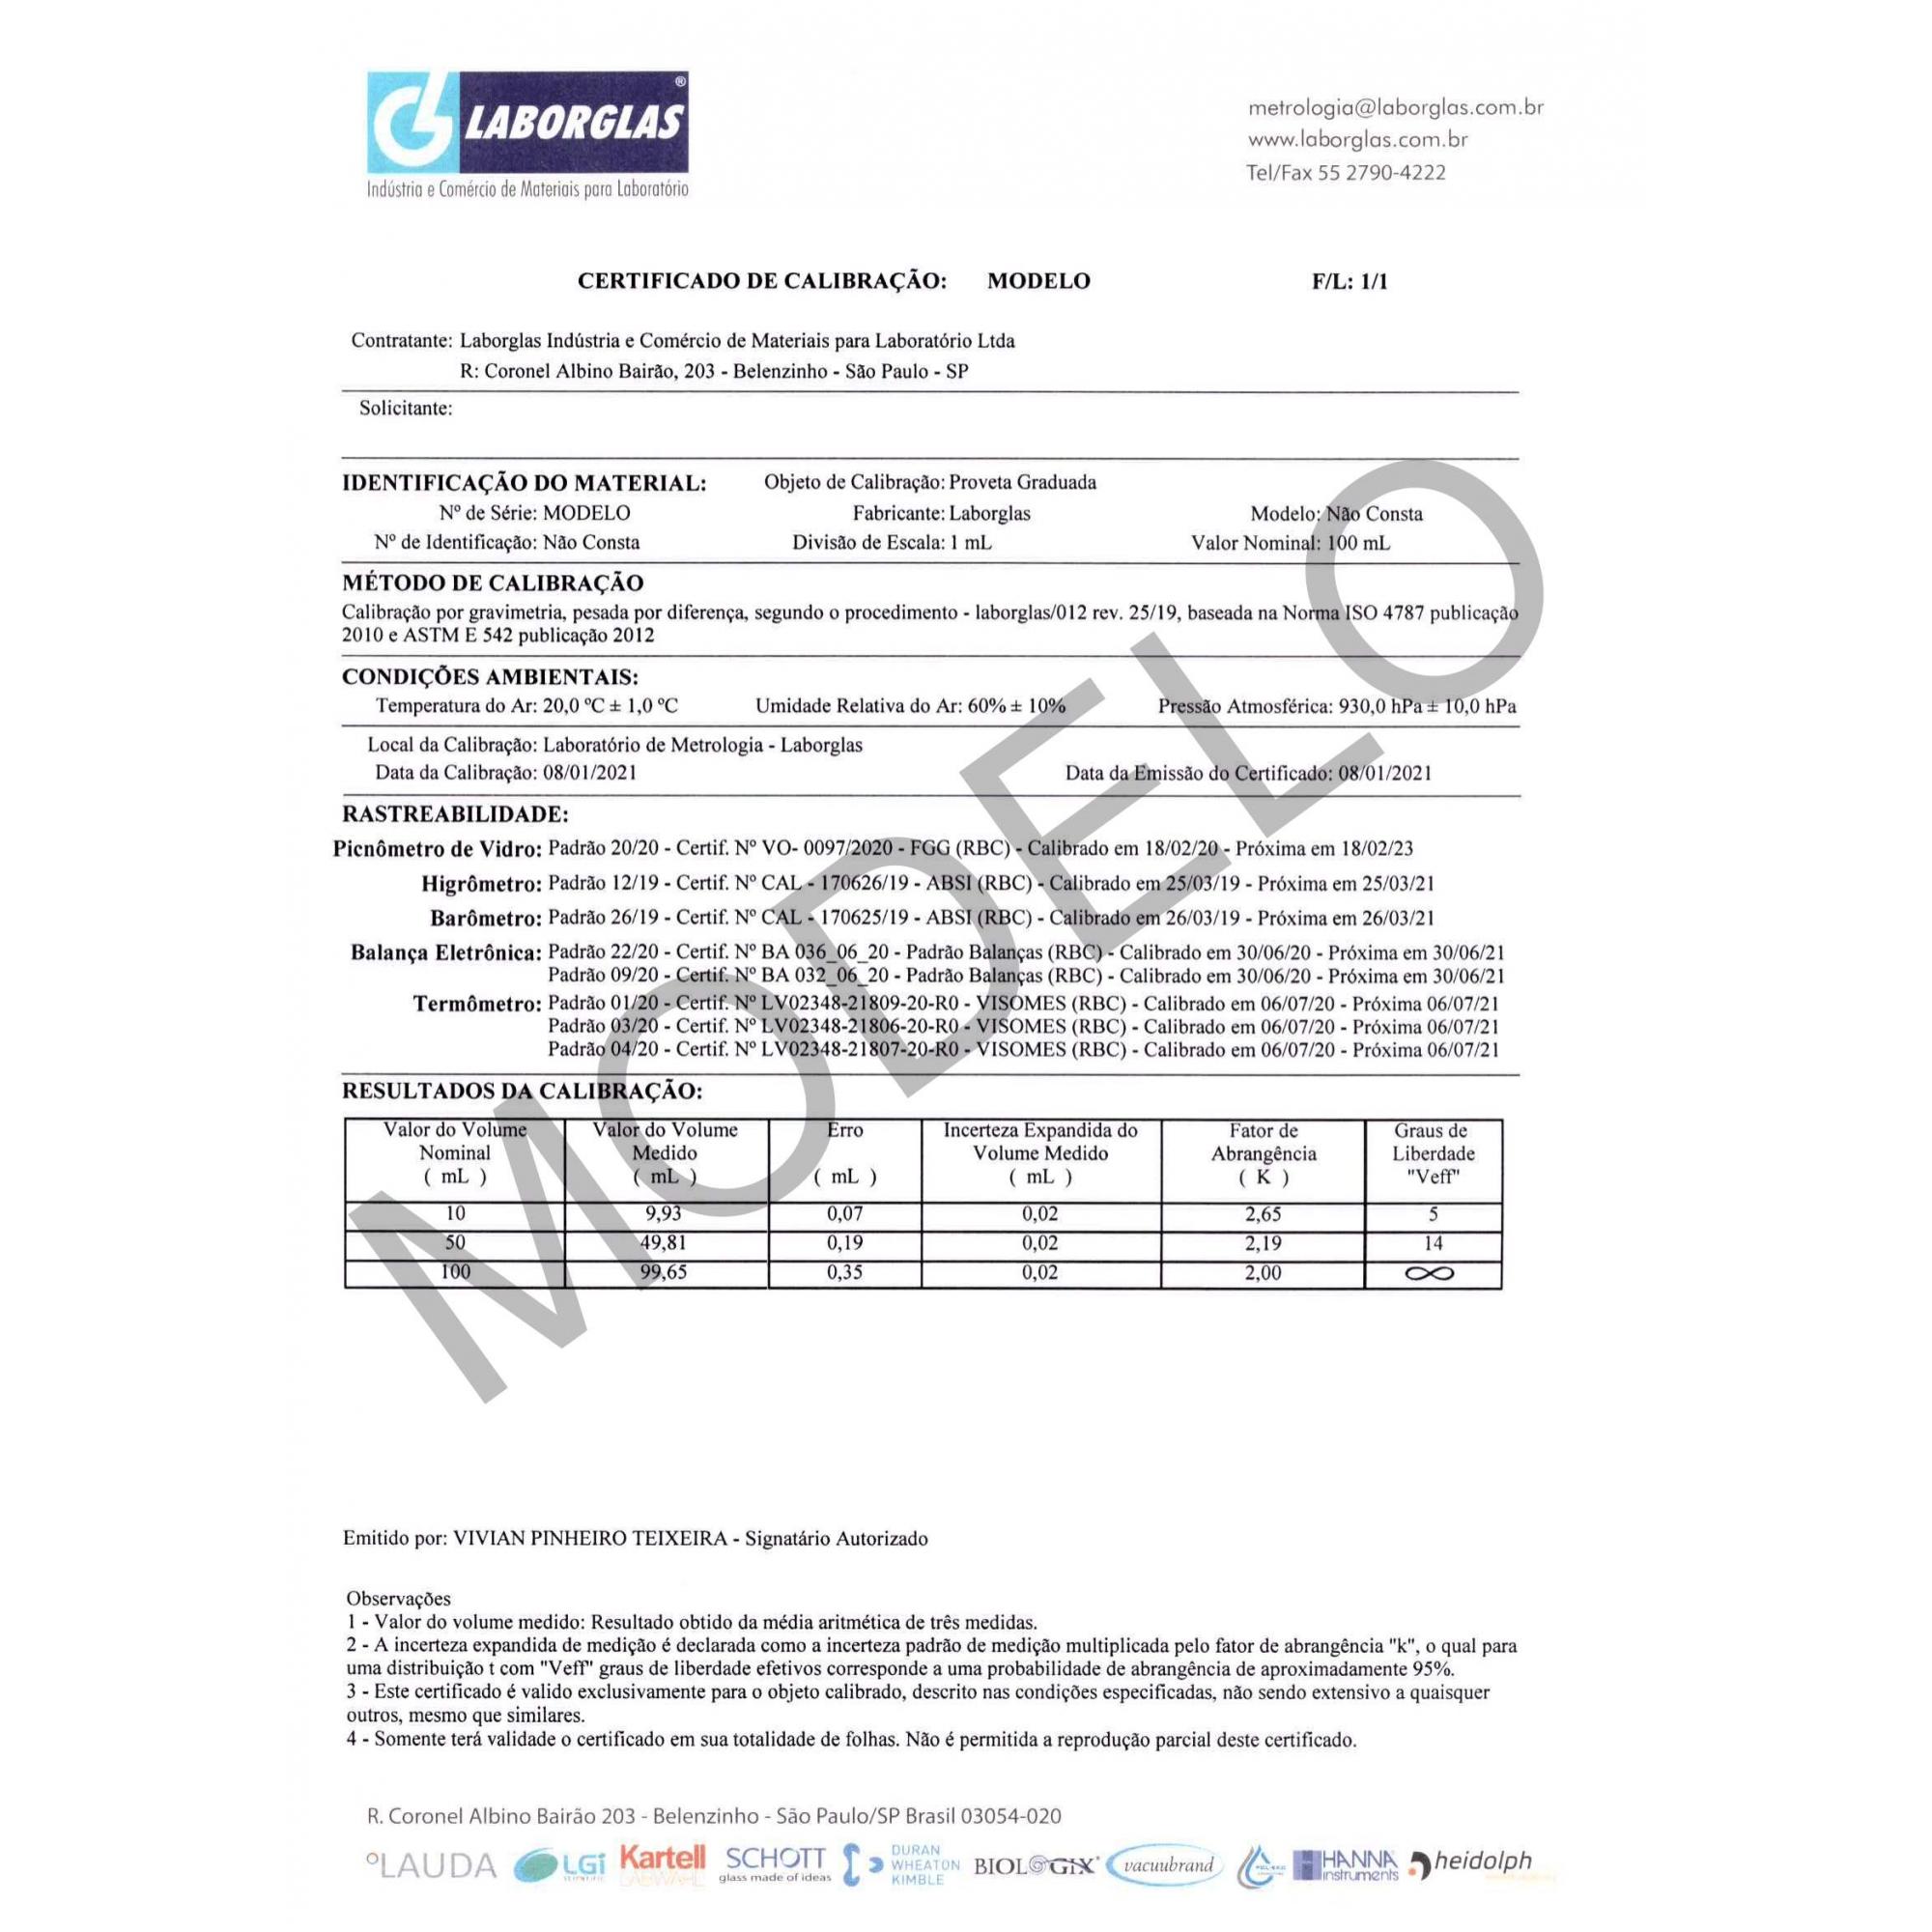 PROVETA GRADUADA BASE HEXAGONAL DE VIDRO 2000 ML CLASSE A CERTIFICADO RASTREÁVEL - Laborglas - Cód. 9139763-C